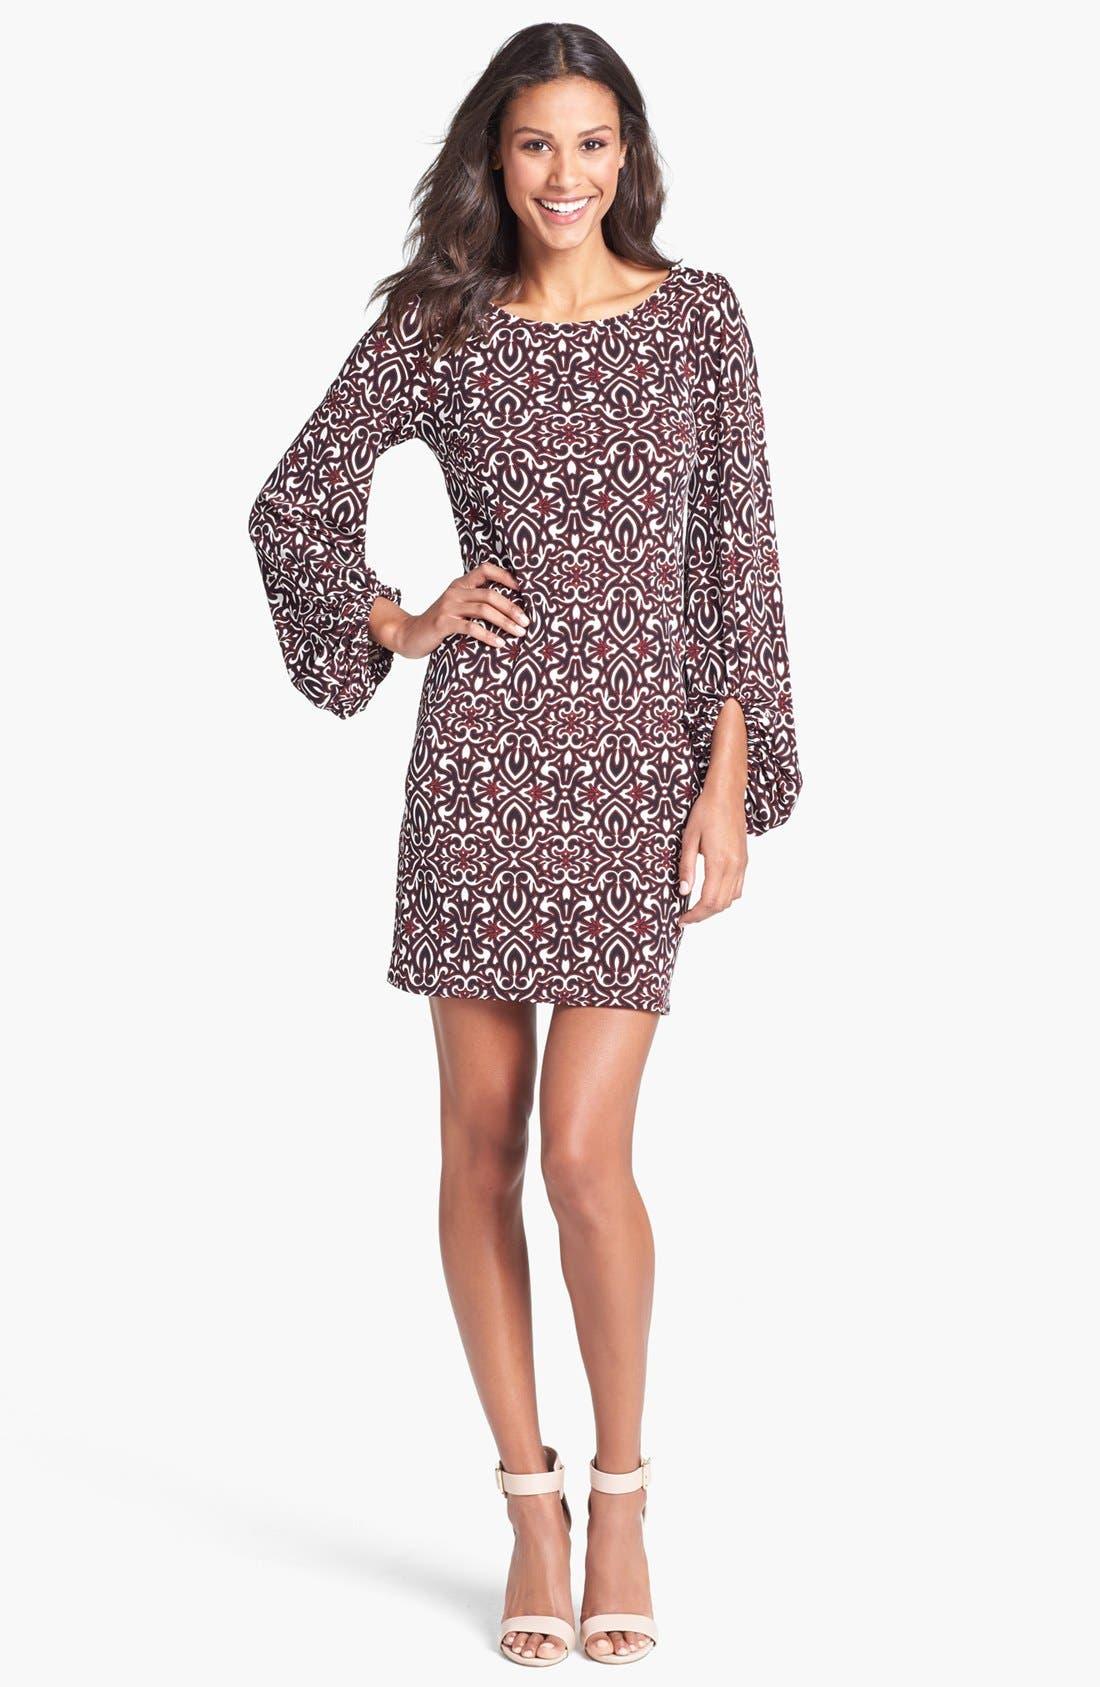 Main Image - Laundry by Shelli Segal Blouson Sleeve Print Jersey Dress (Regular & Petite)